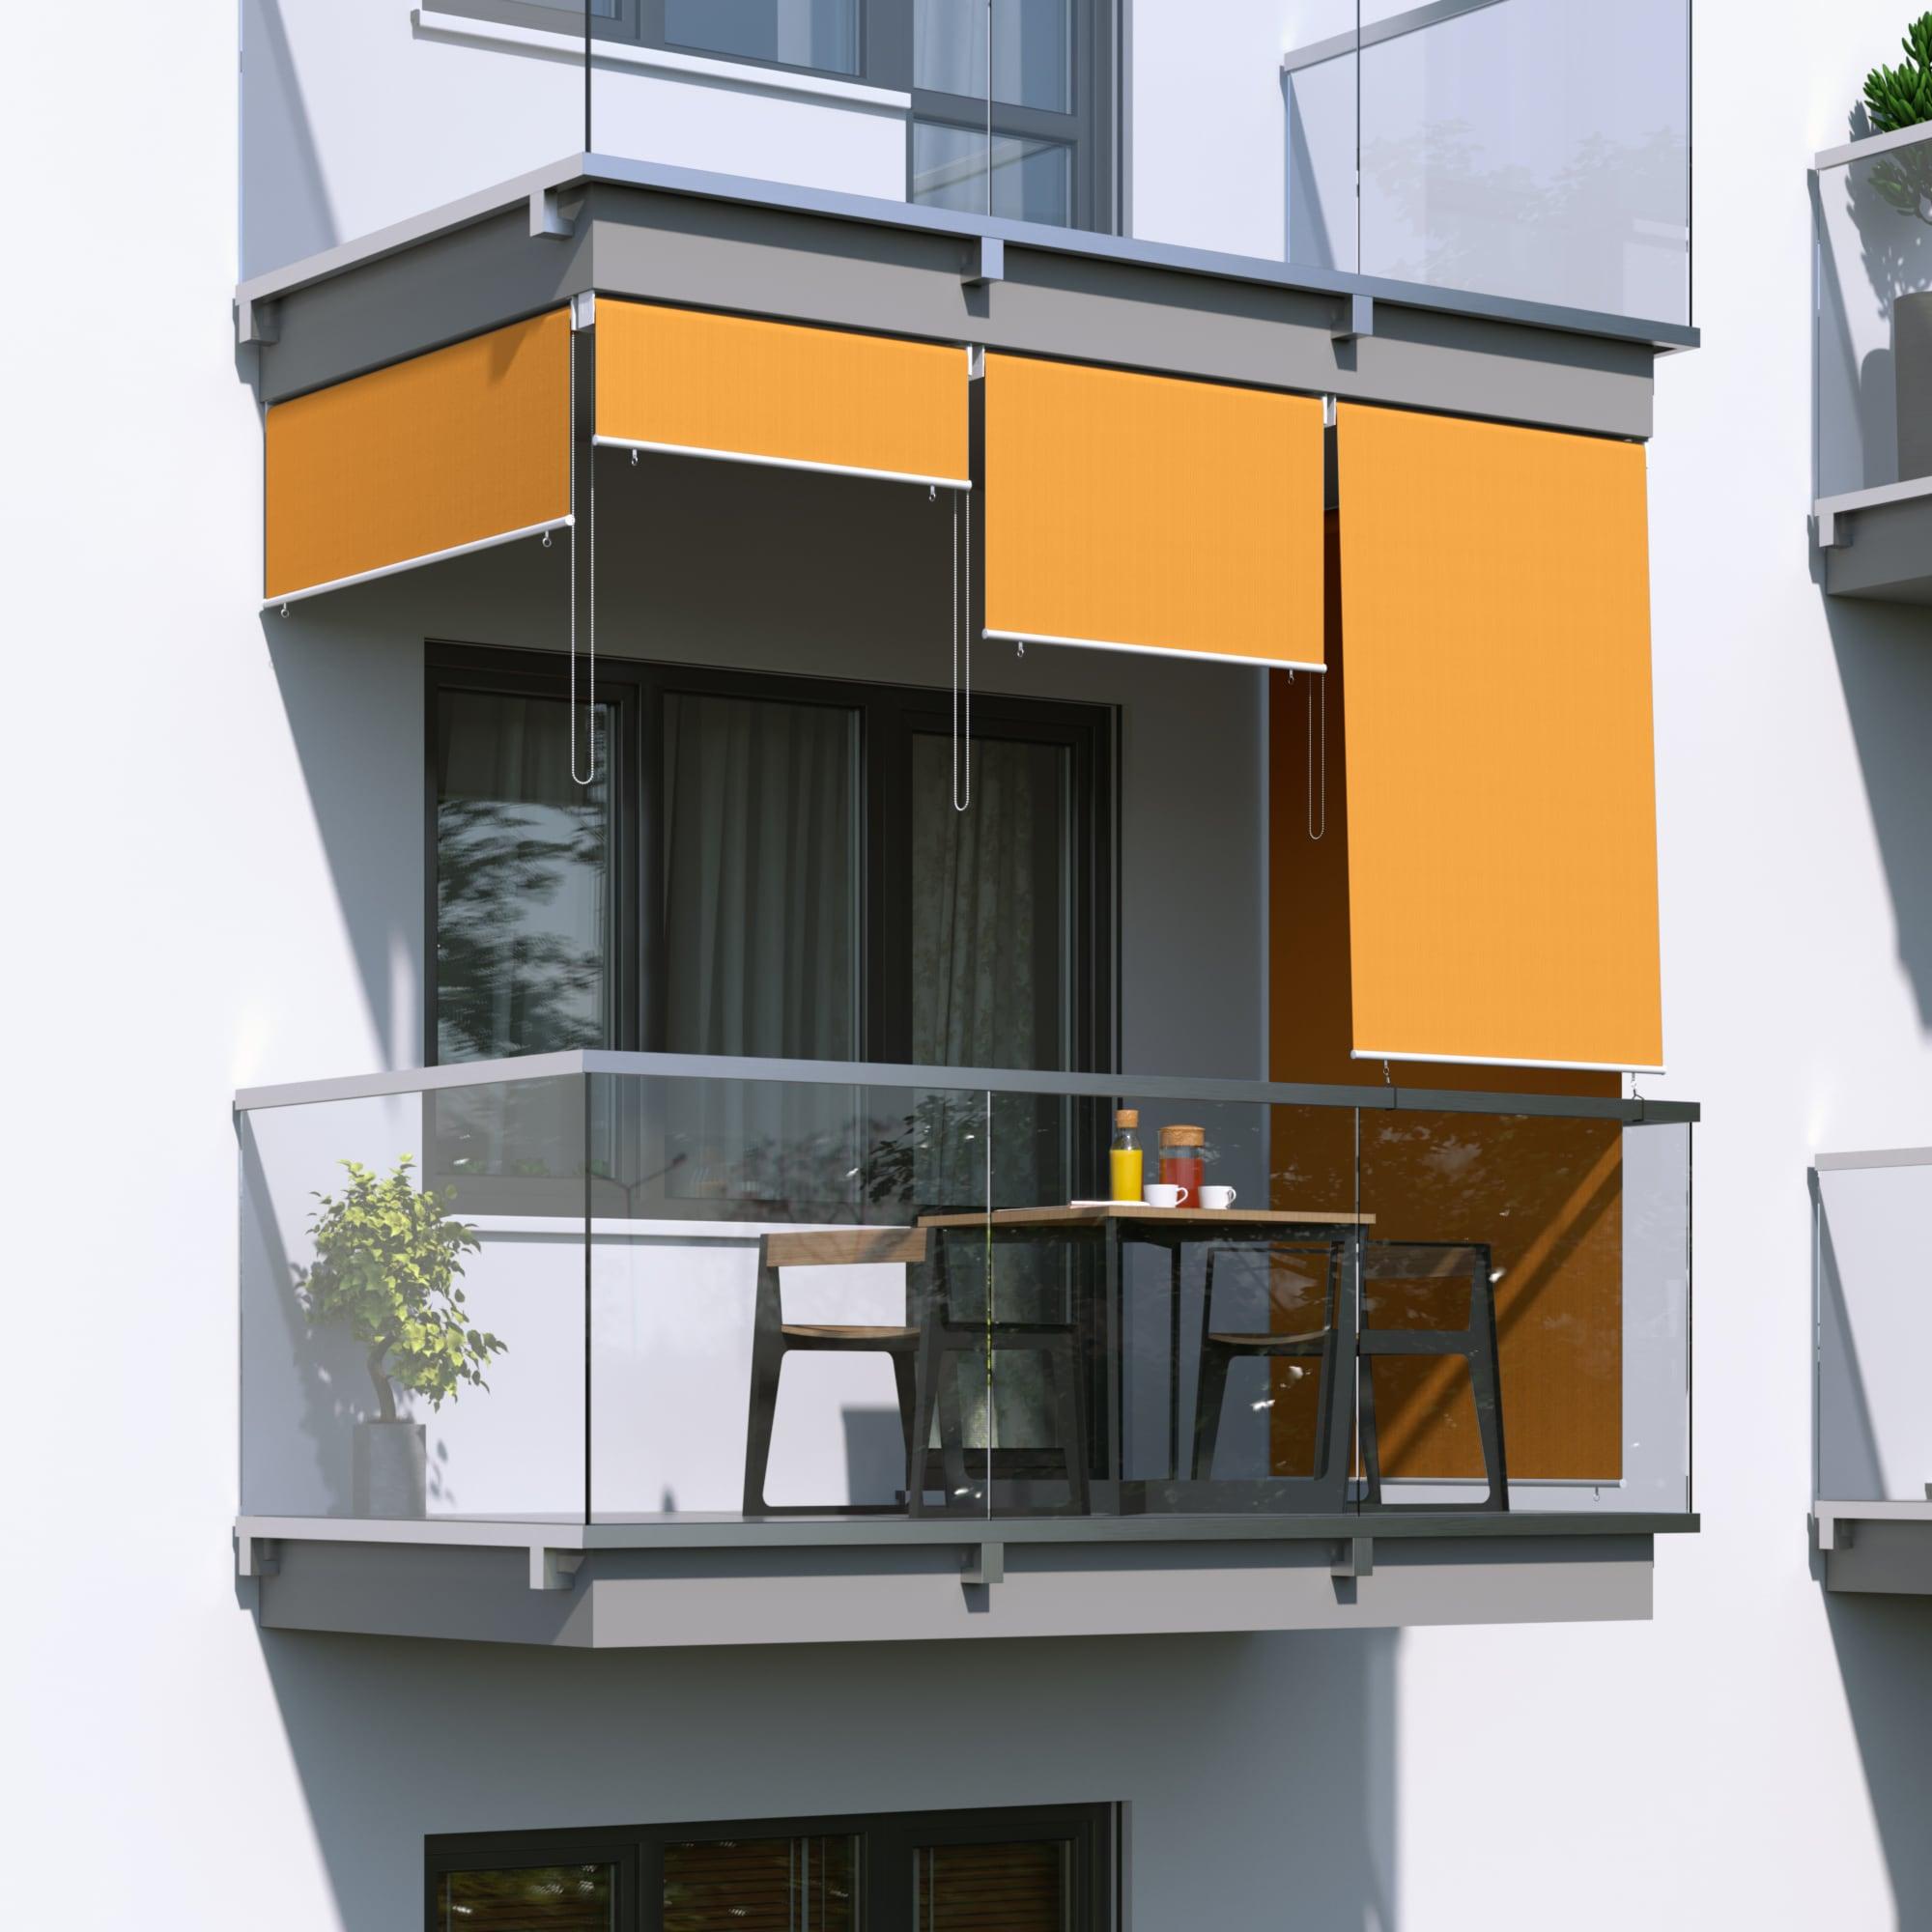 JAROLIFT-Senkrechtmarkise-Sichtschutz-Aussenrollo-Sonnenschutz-Aussen-Rollo-Balkon Indexbild 8